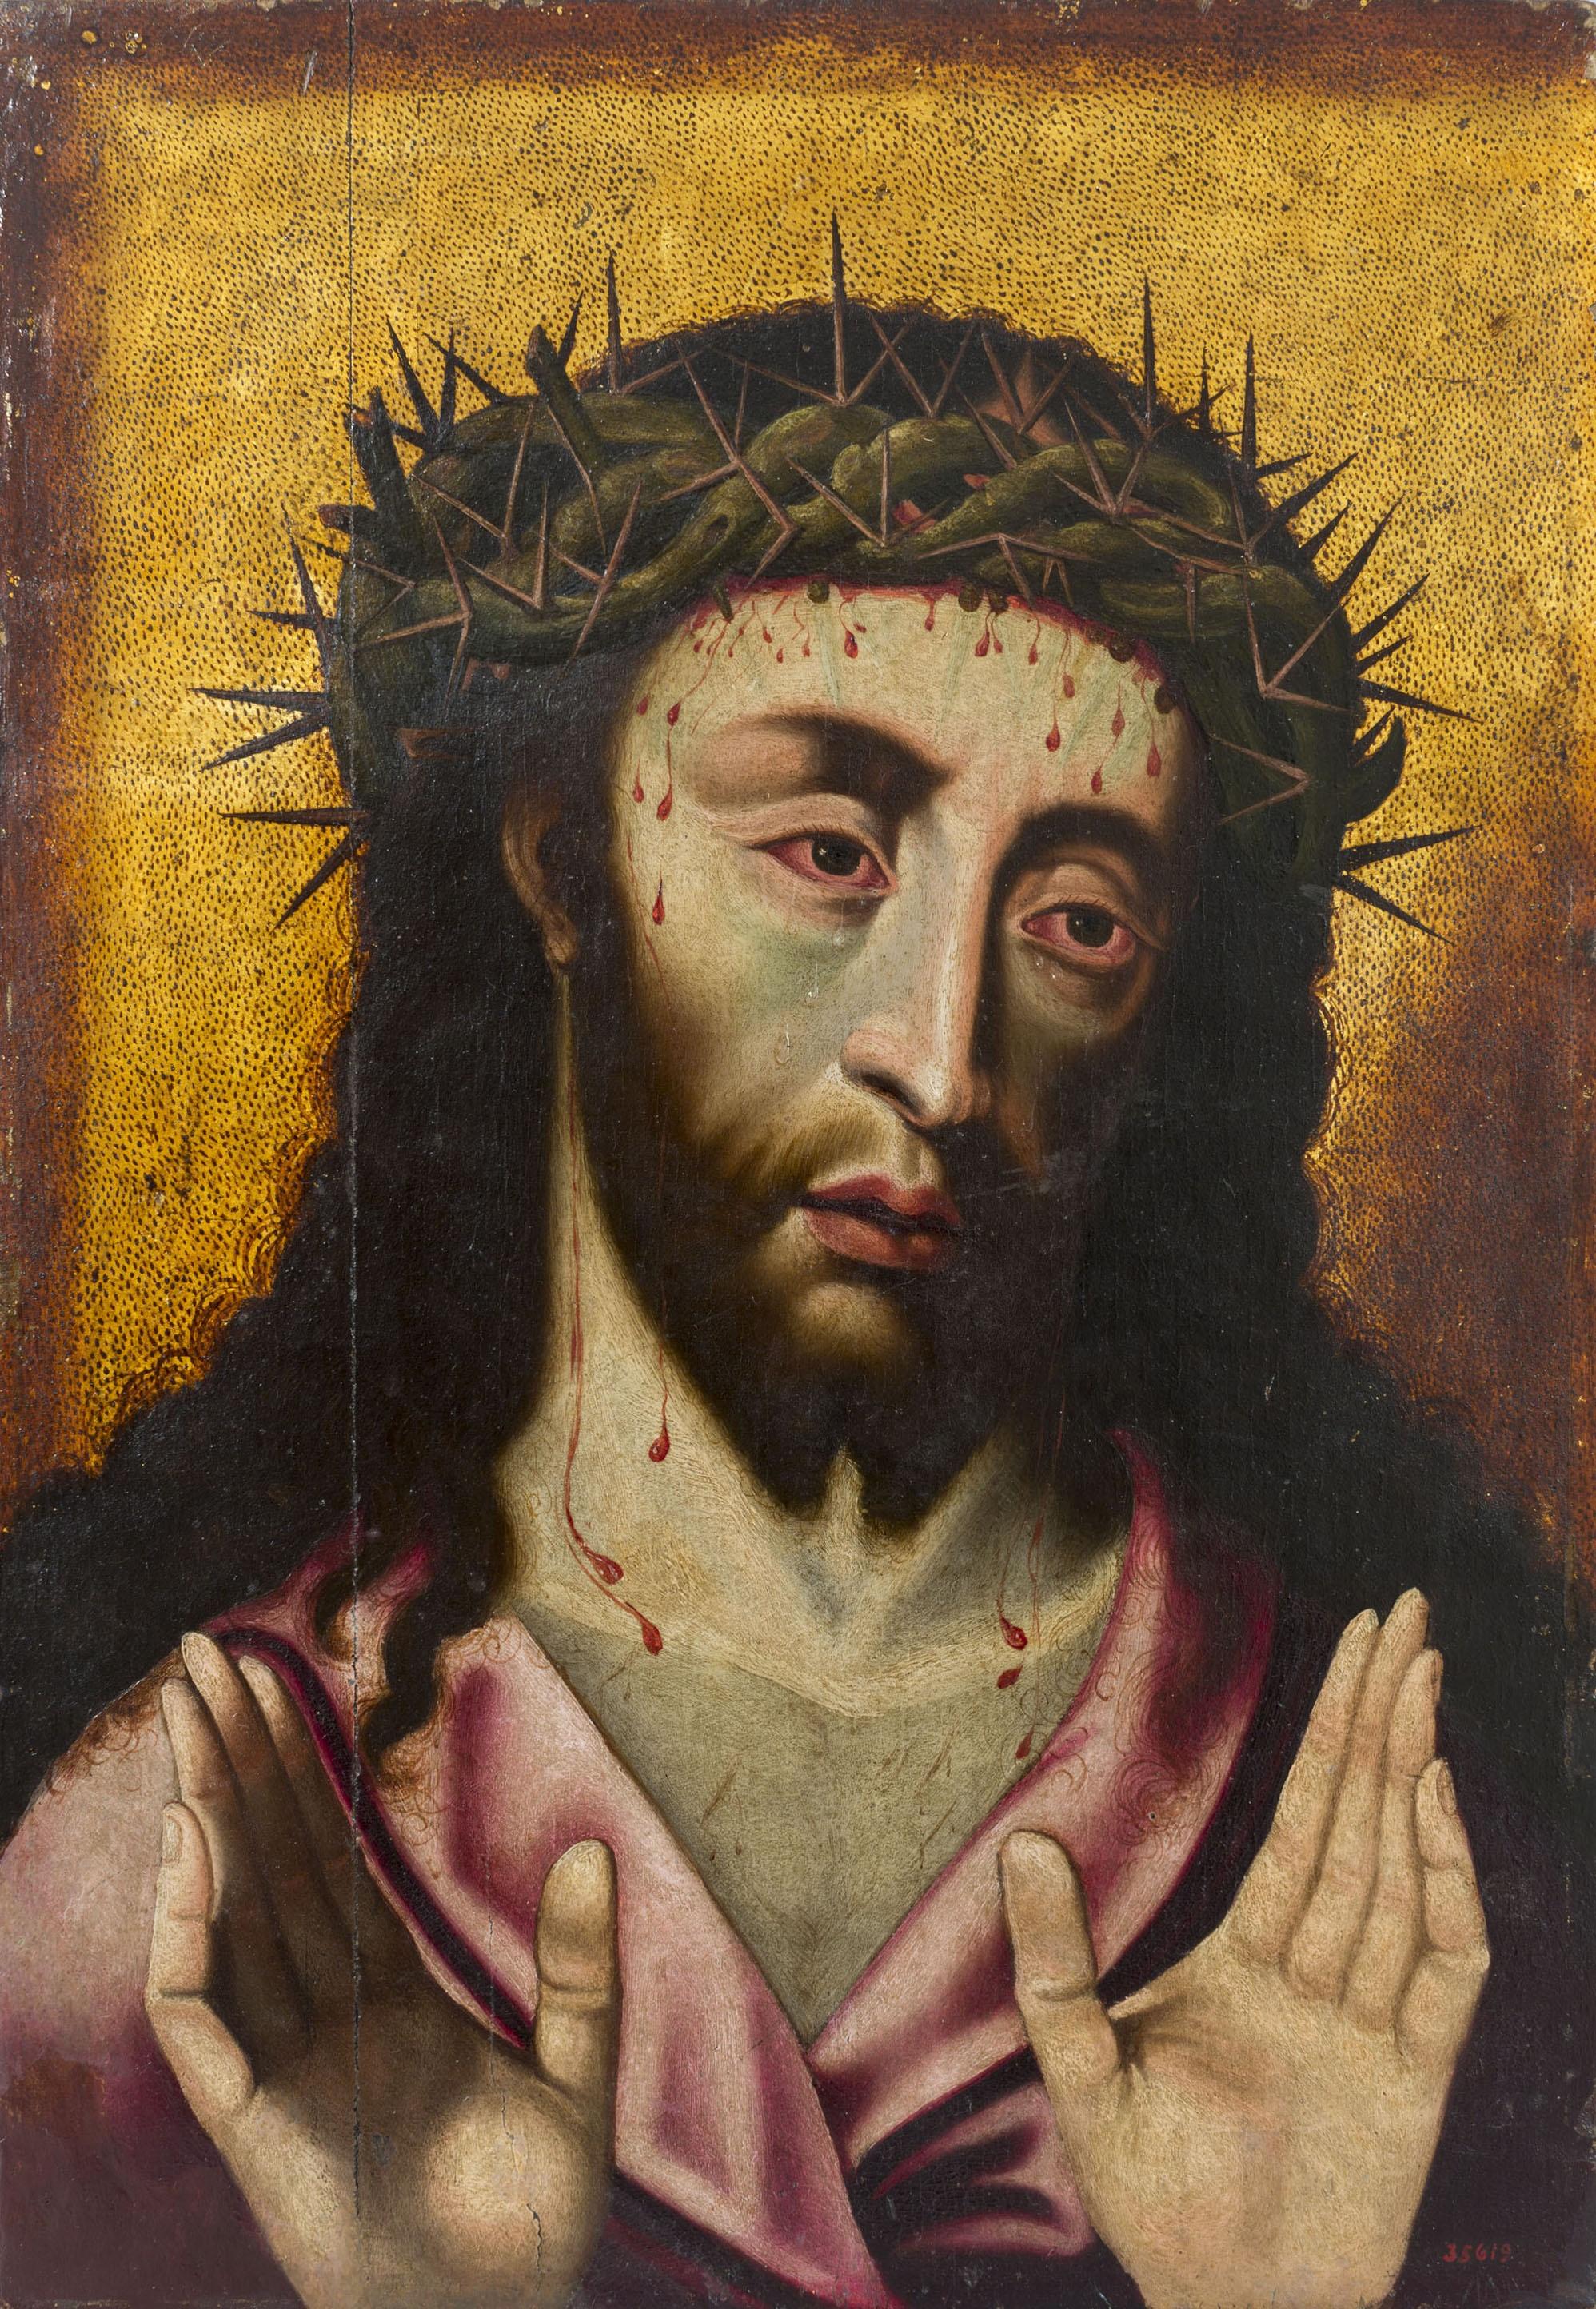 Anònim. Castella - Man of Sorrows - Second quarter of the 16th century